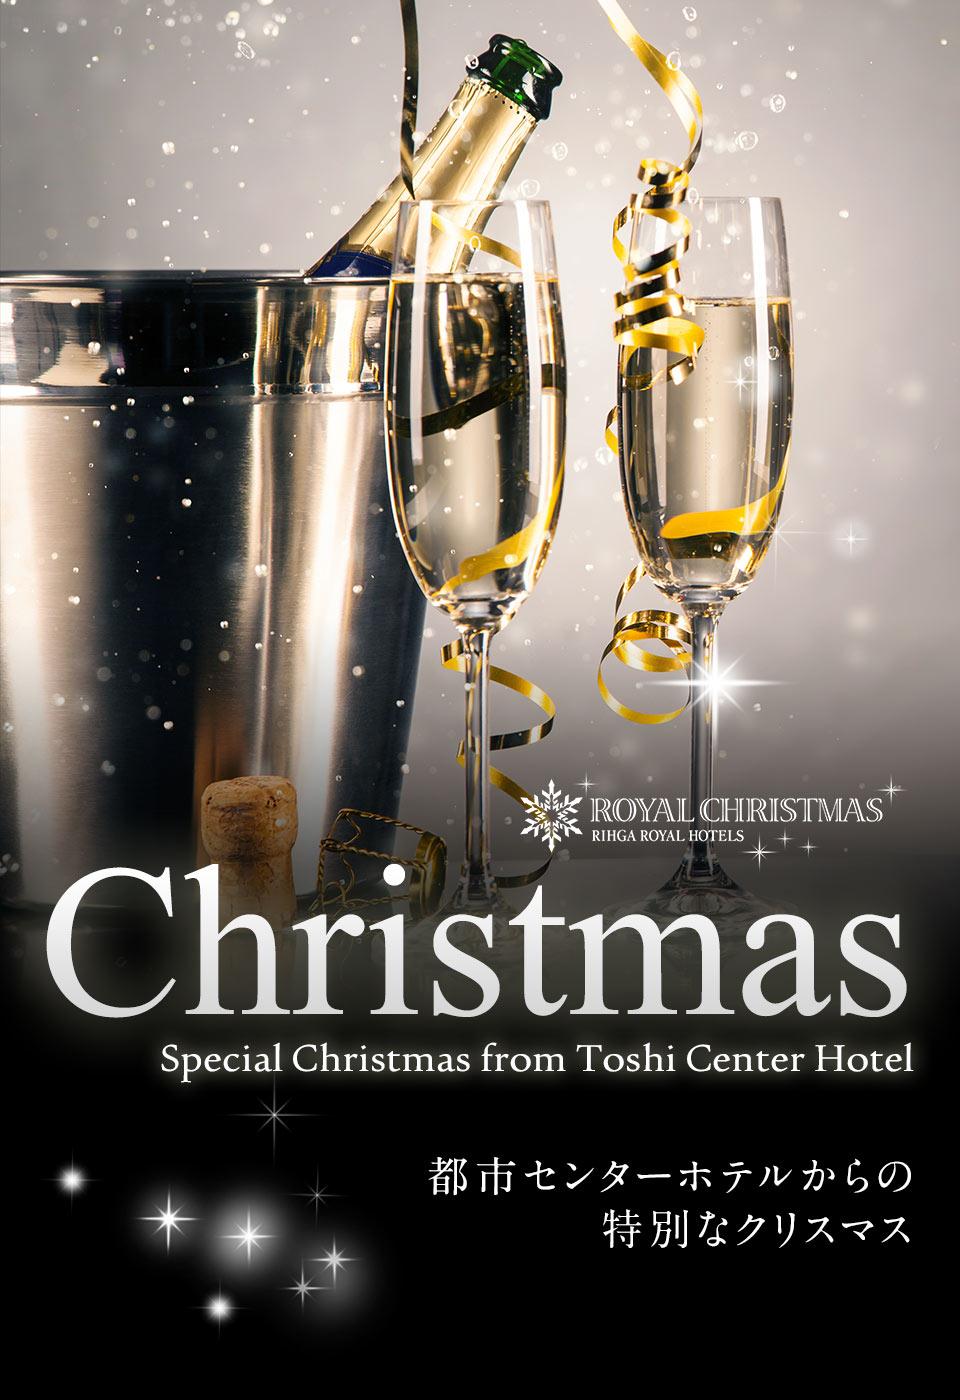 ROYAL CHIRISTMAS 都市センターホテルからの特別なクリスマス